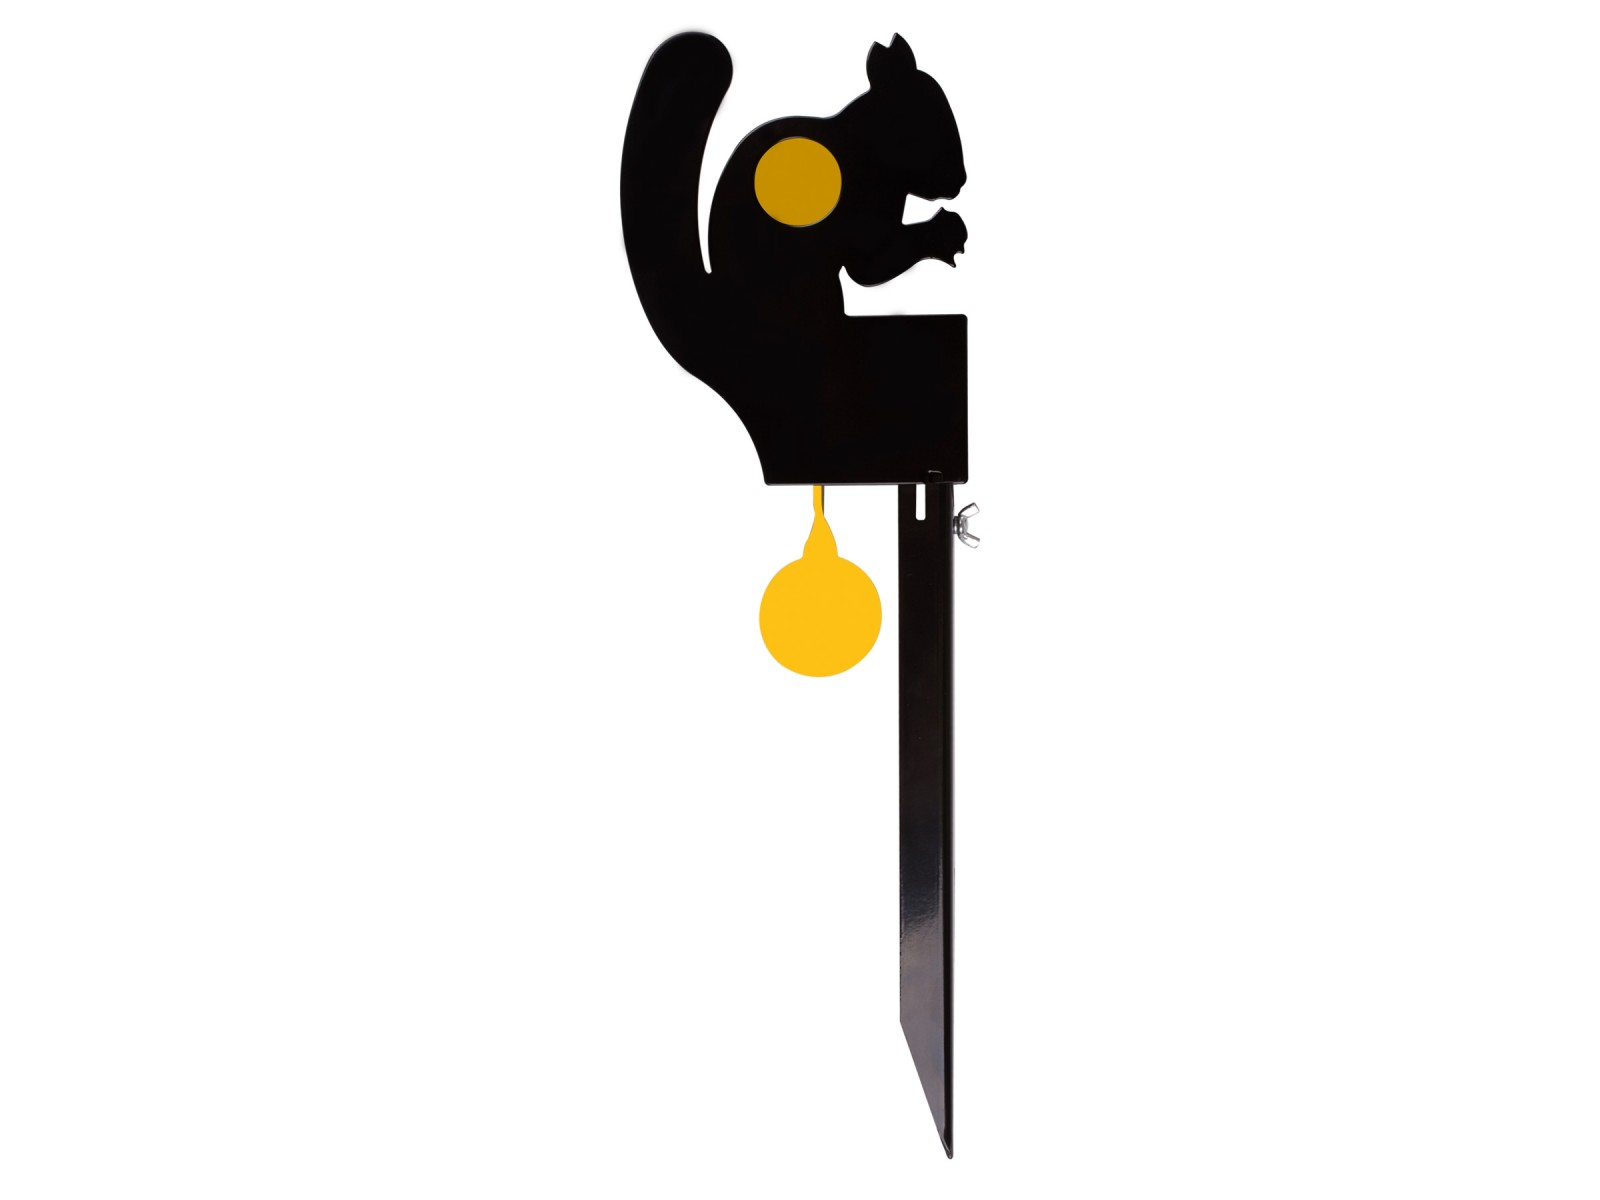 Crosman Squirrel Resetting Target